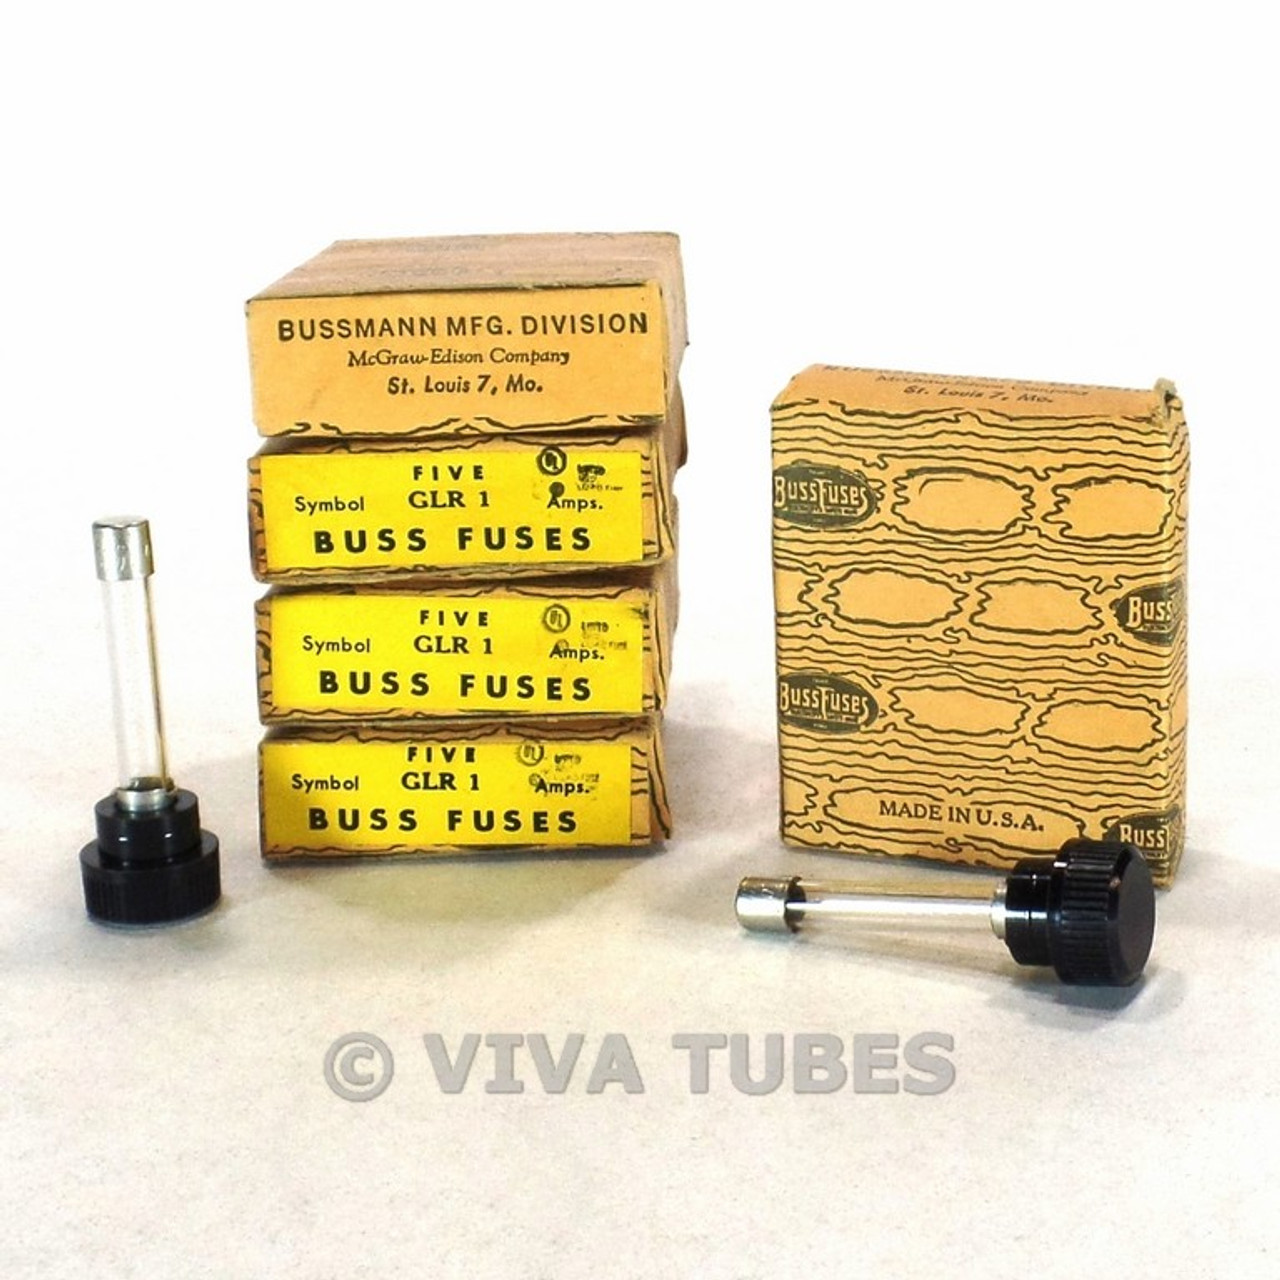 small resolution of set of 20 nos nib vintage bussman fuses type glr 1 aamp 300 v panel mount fuses viva tubes